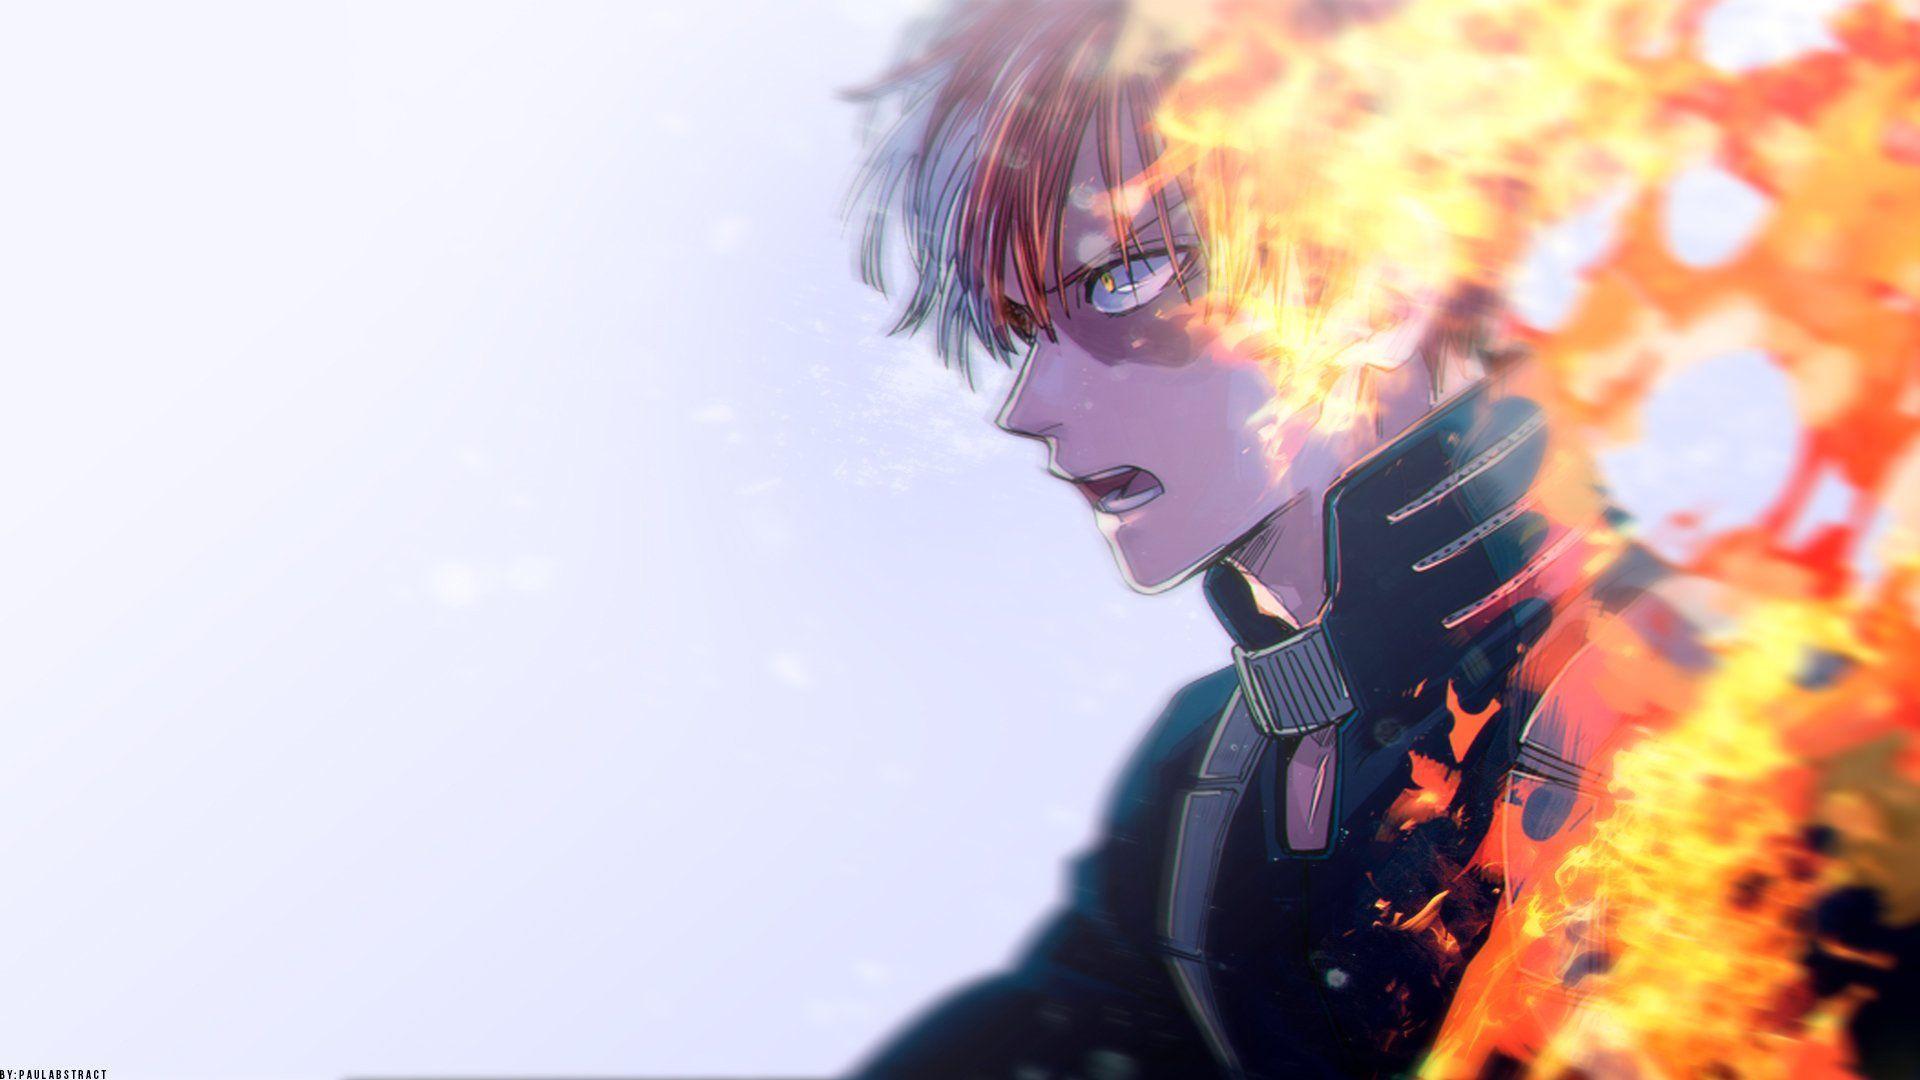 Katsuki bakugou 4k & hd anime live my hero wallpapers academia background. My Hero Academia Todoroki Wallpapers - Top Free My Hero ...